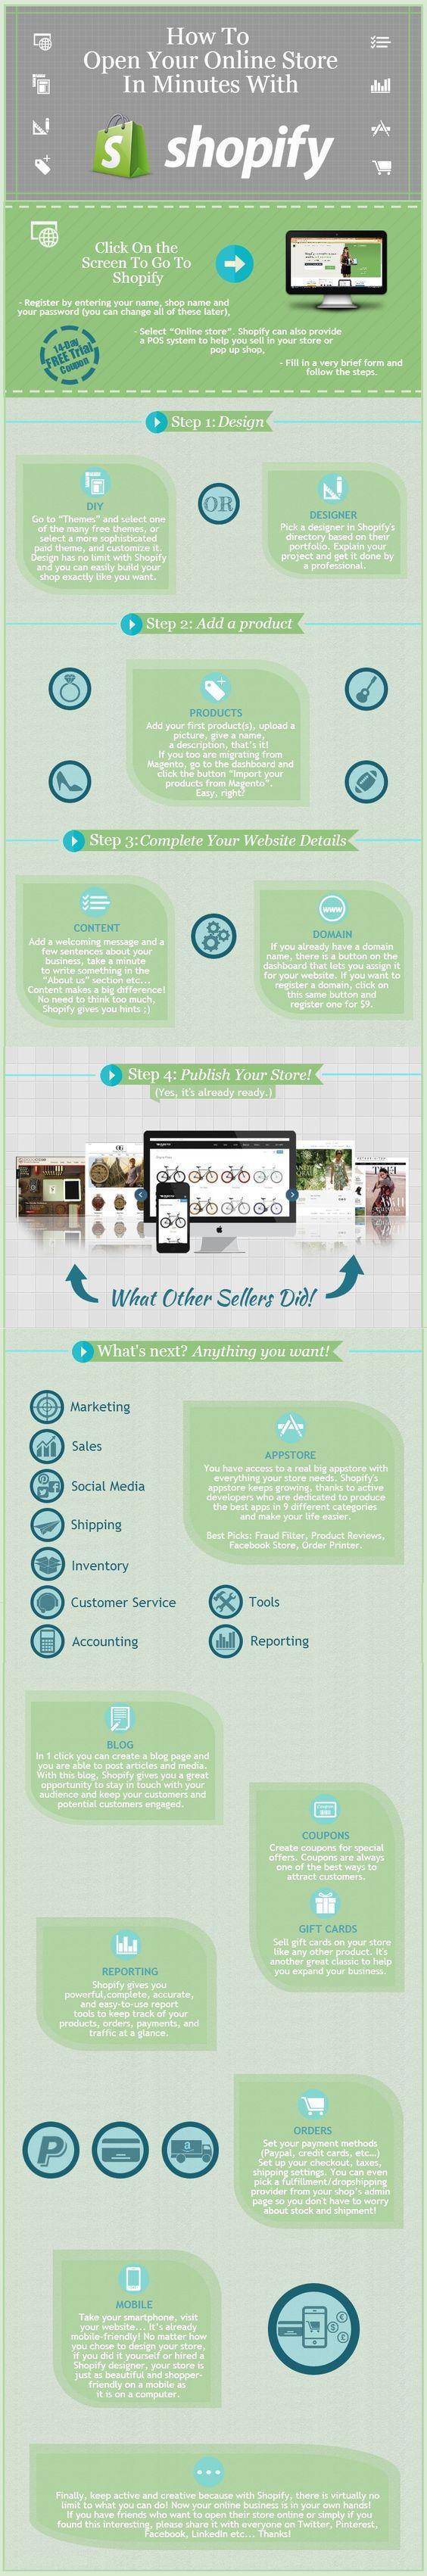 Start A Online Store Free | Home improvement | Drop shipping